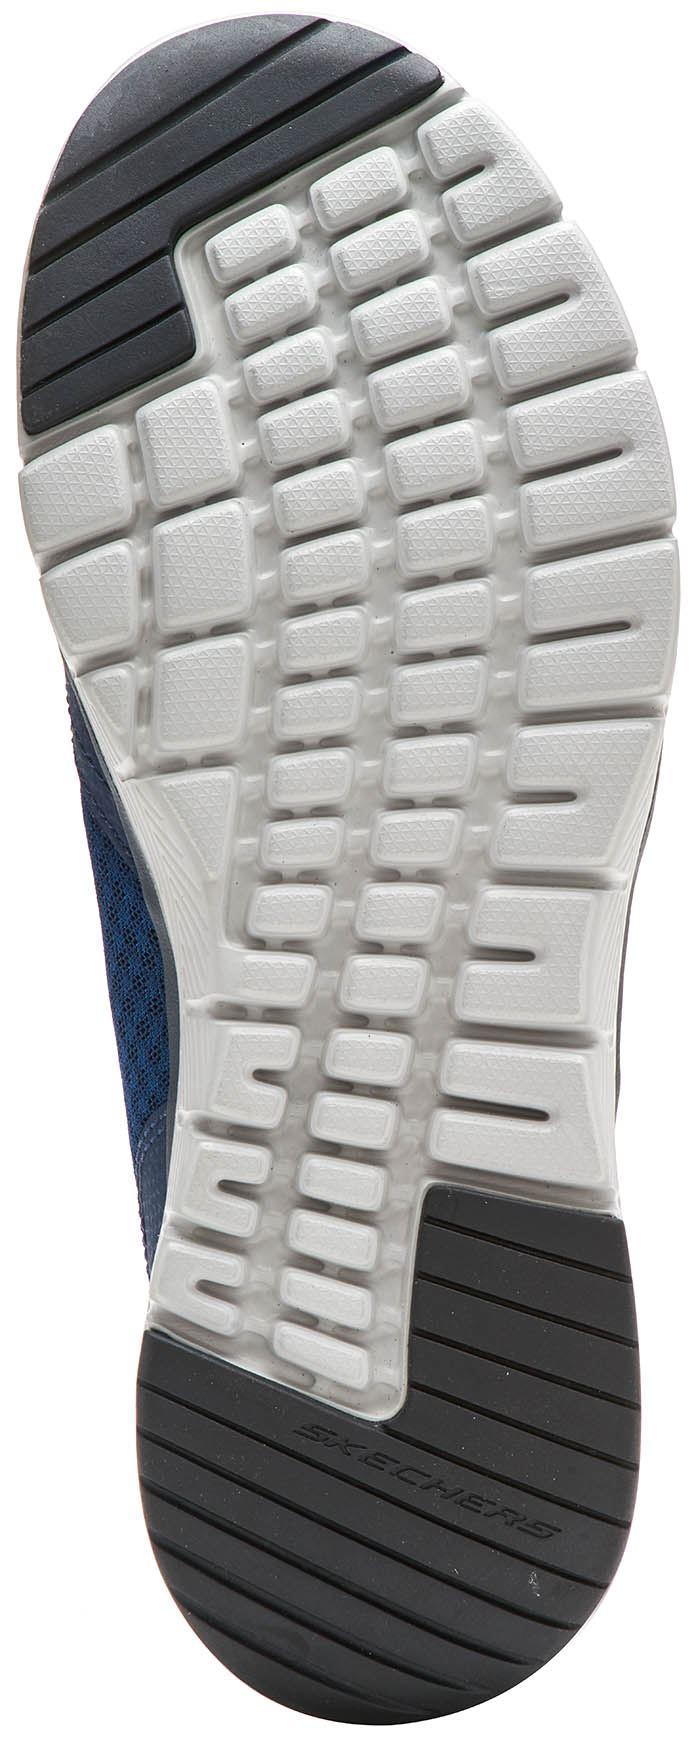 Skechers-FLEX-ADVANTAGE-3-0-con-Cordones-Fitness-Correr-Entrenadores-de-espuma-de-memoria miniatura 17